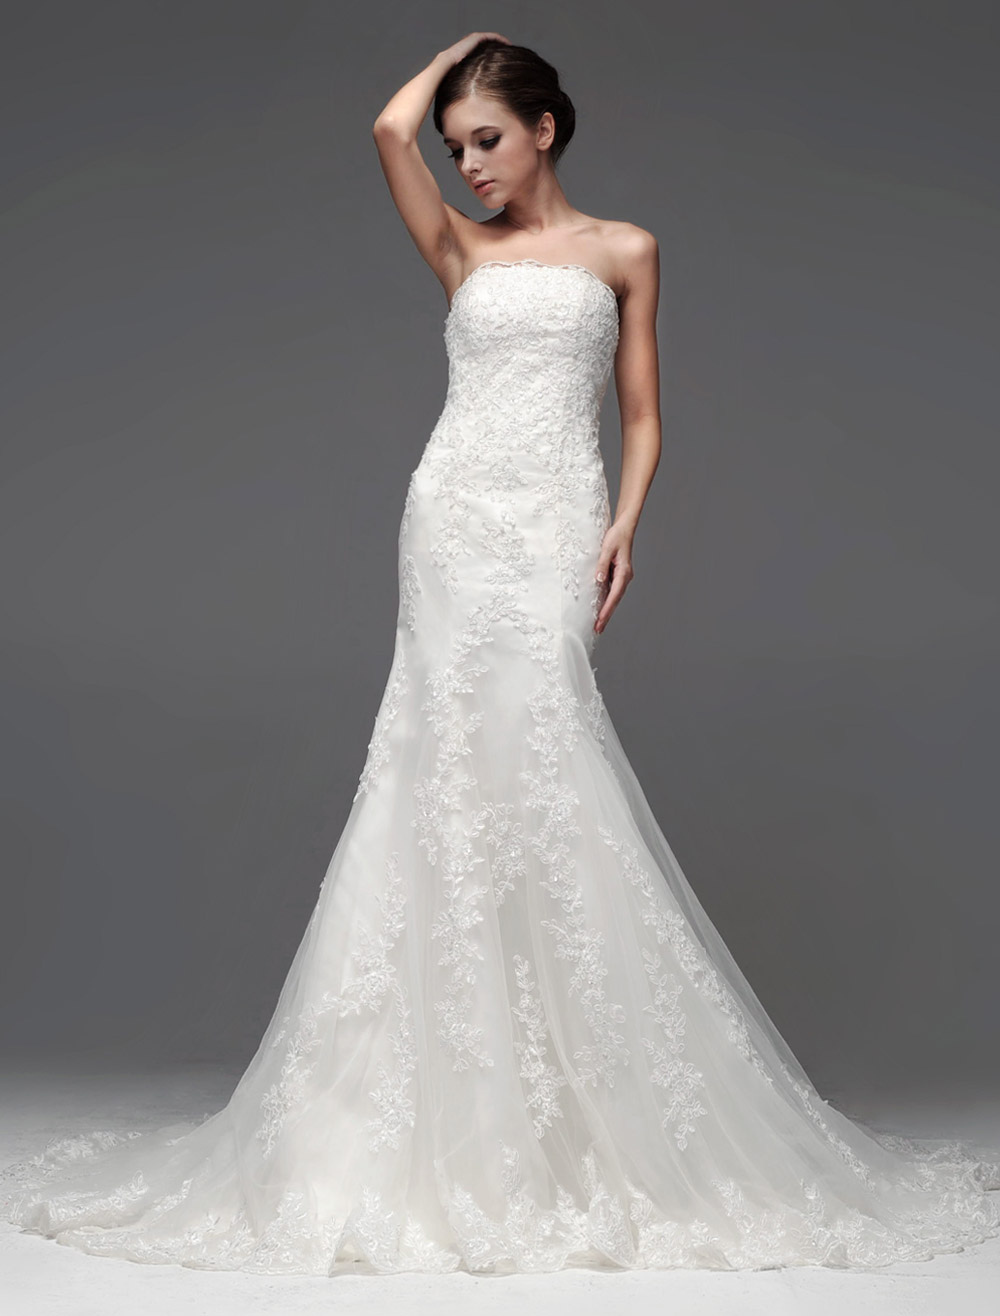 Court Train Strapless Bridal Wedding Dress photo